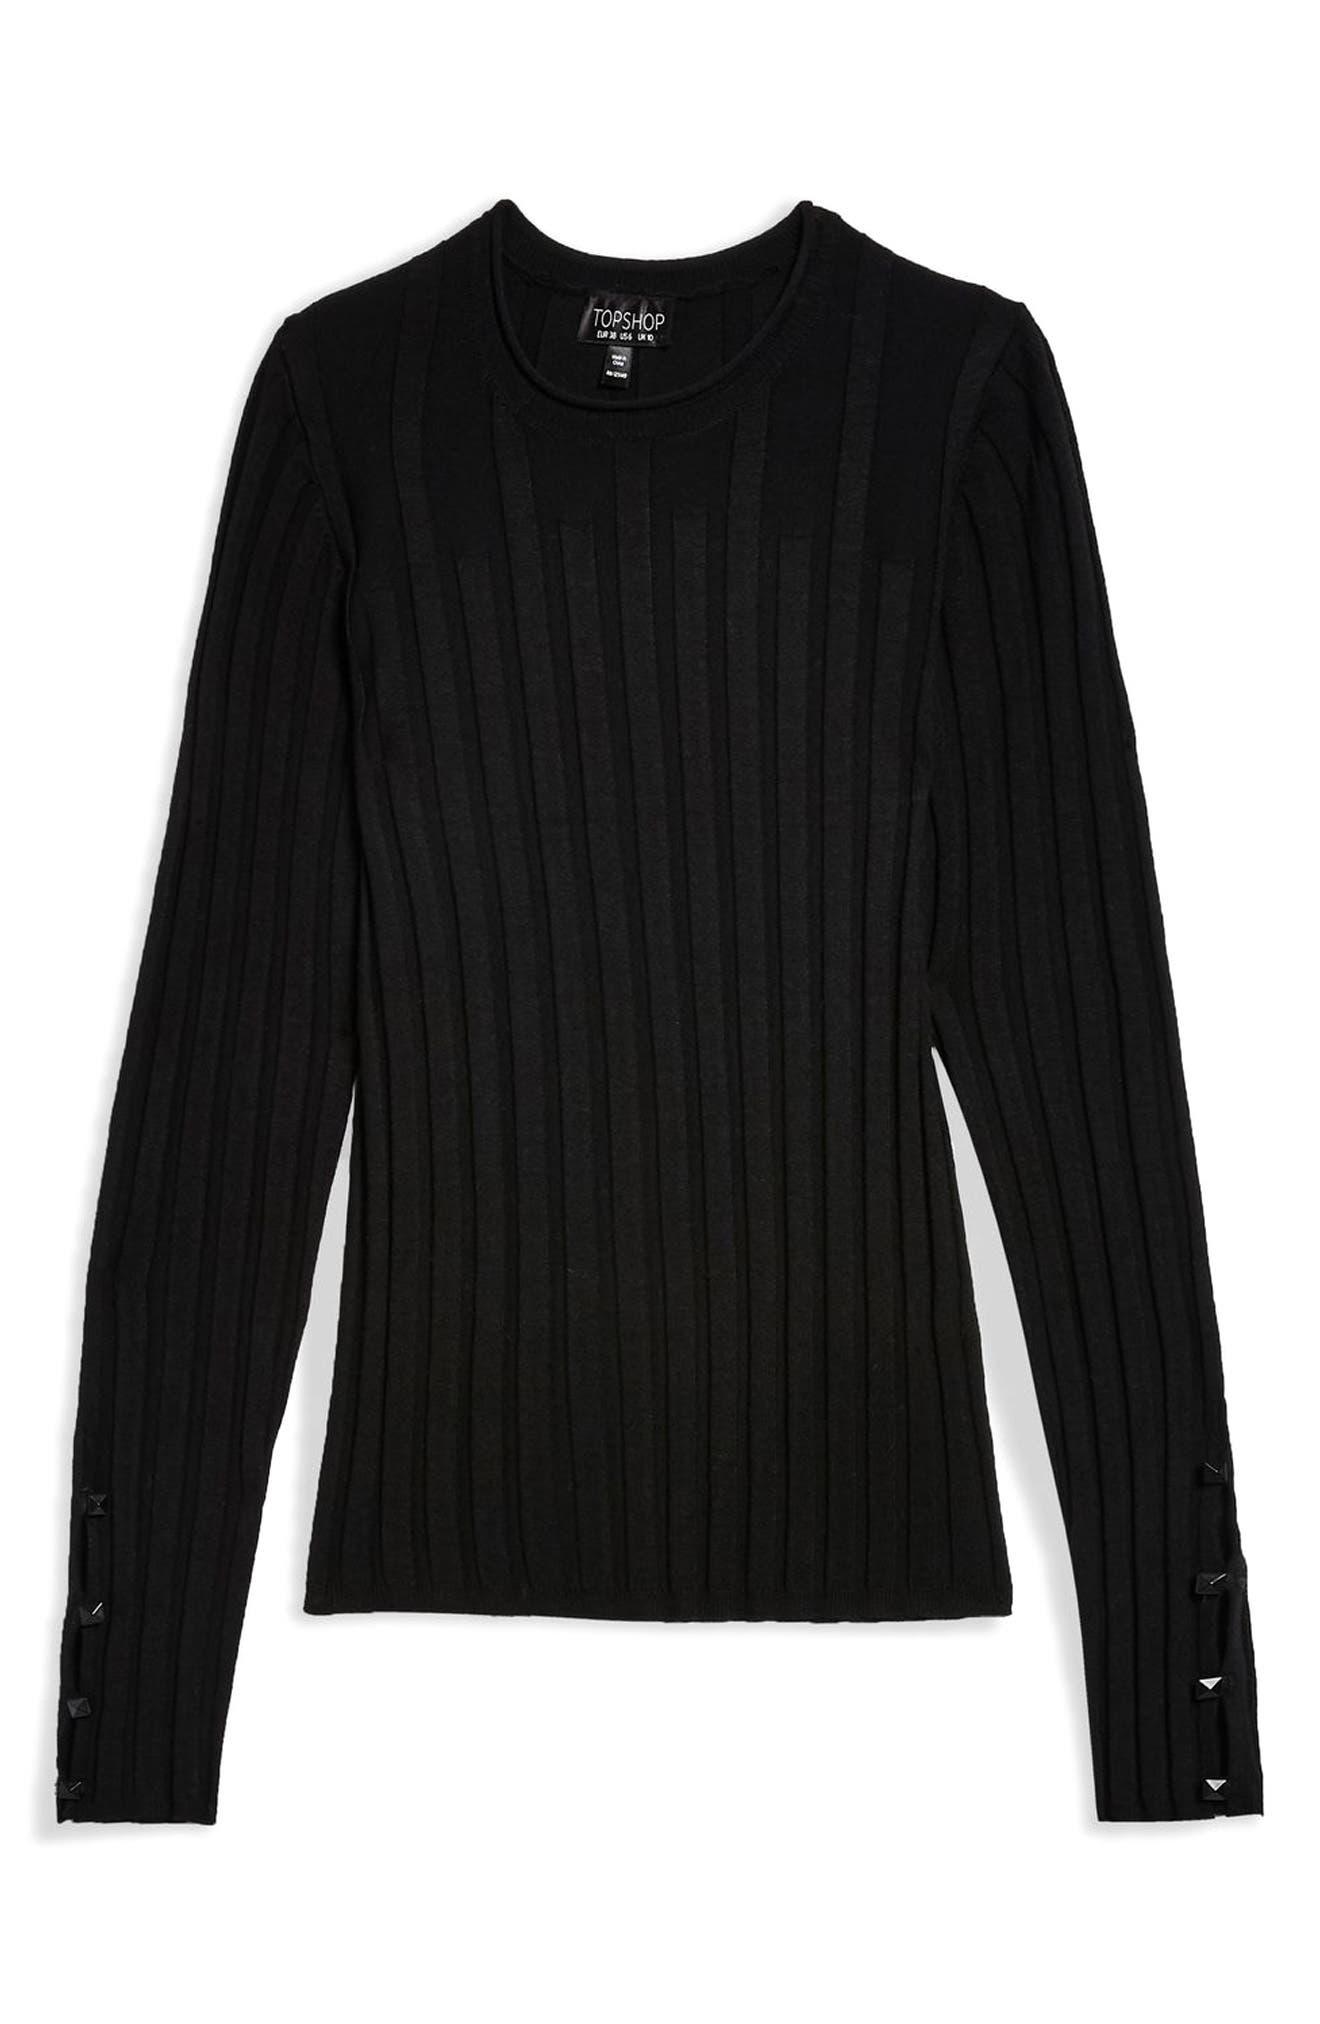 TOPSHOP,                             Ribbed Sweater,                             Alternate thumbnail 3, color,                             BLACK